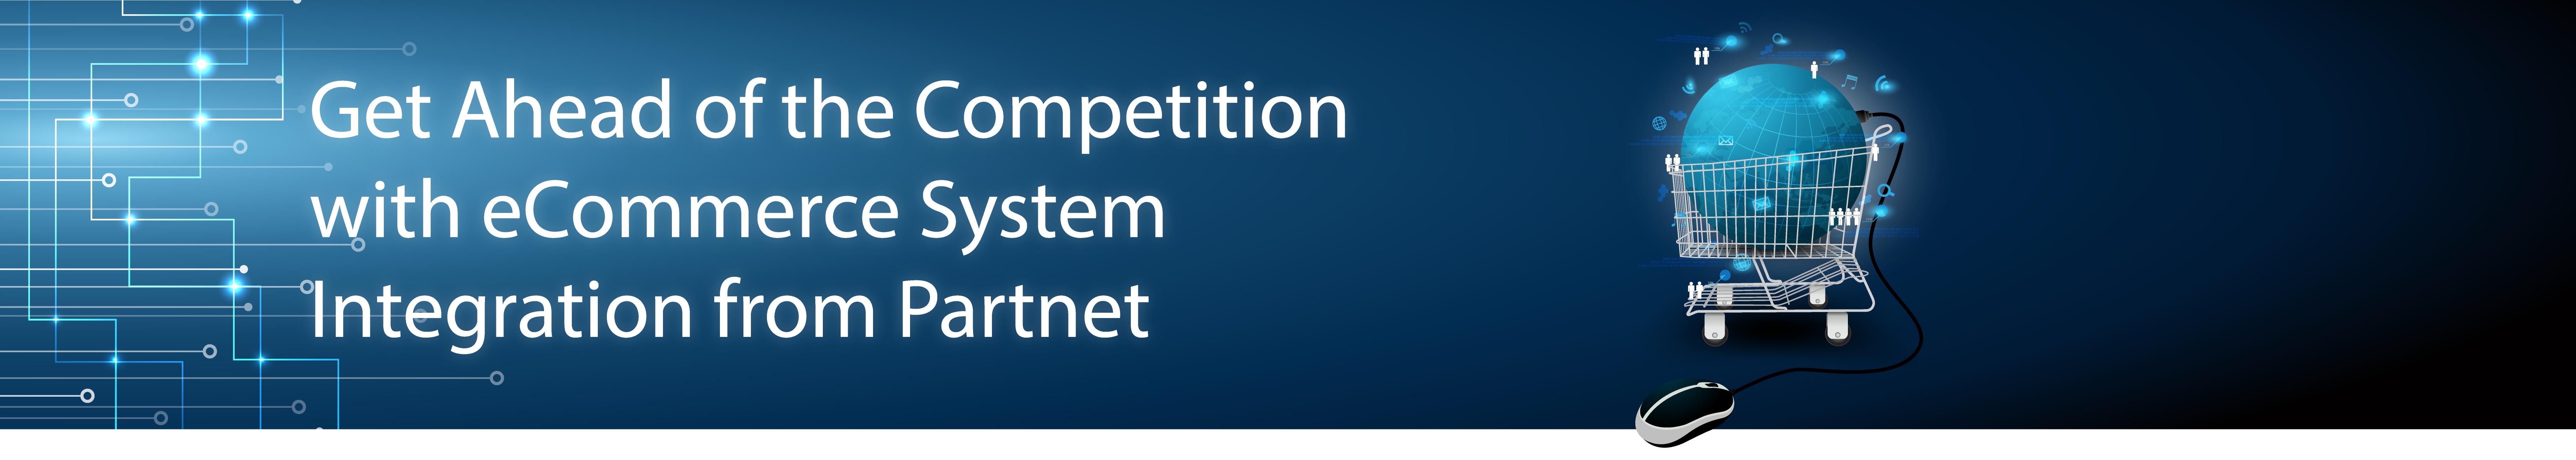 eCommerceSystemIntegration3-01